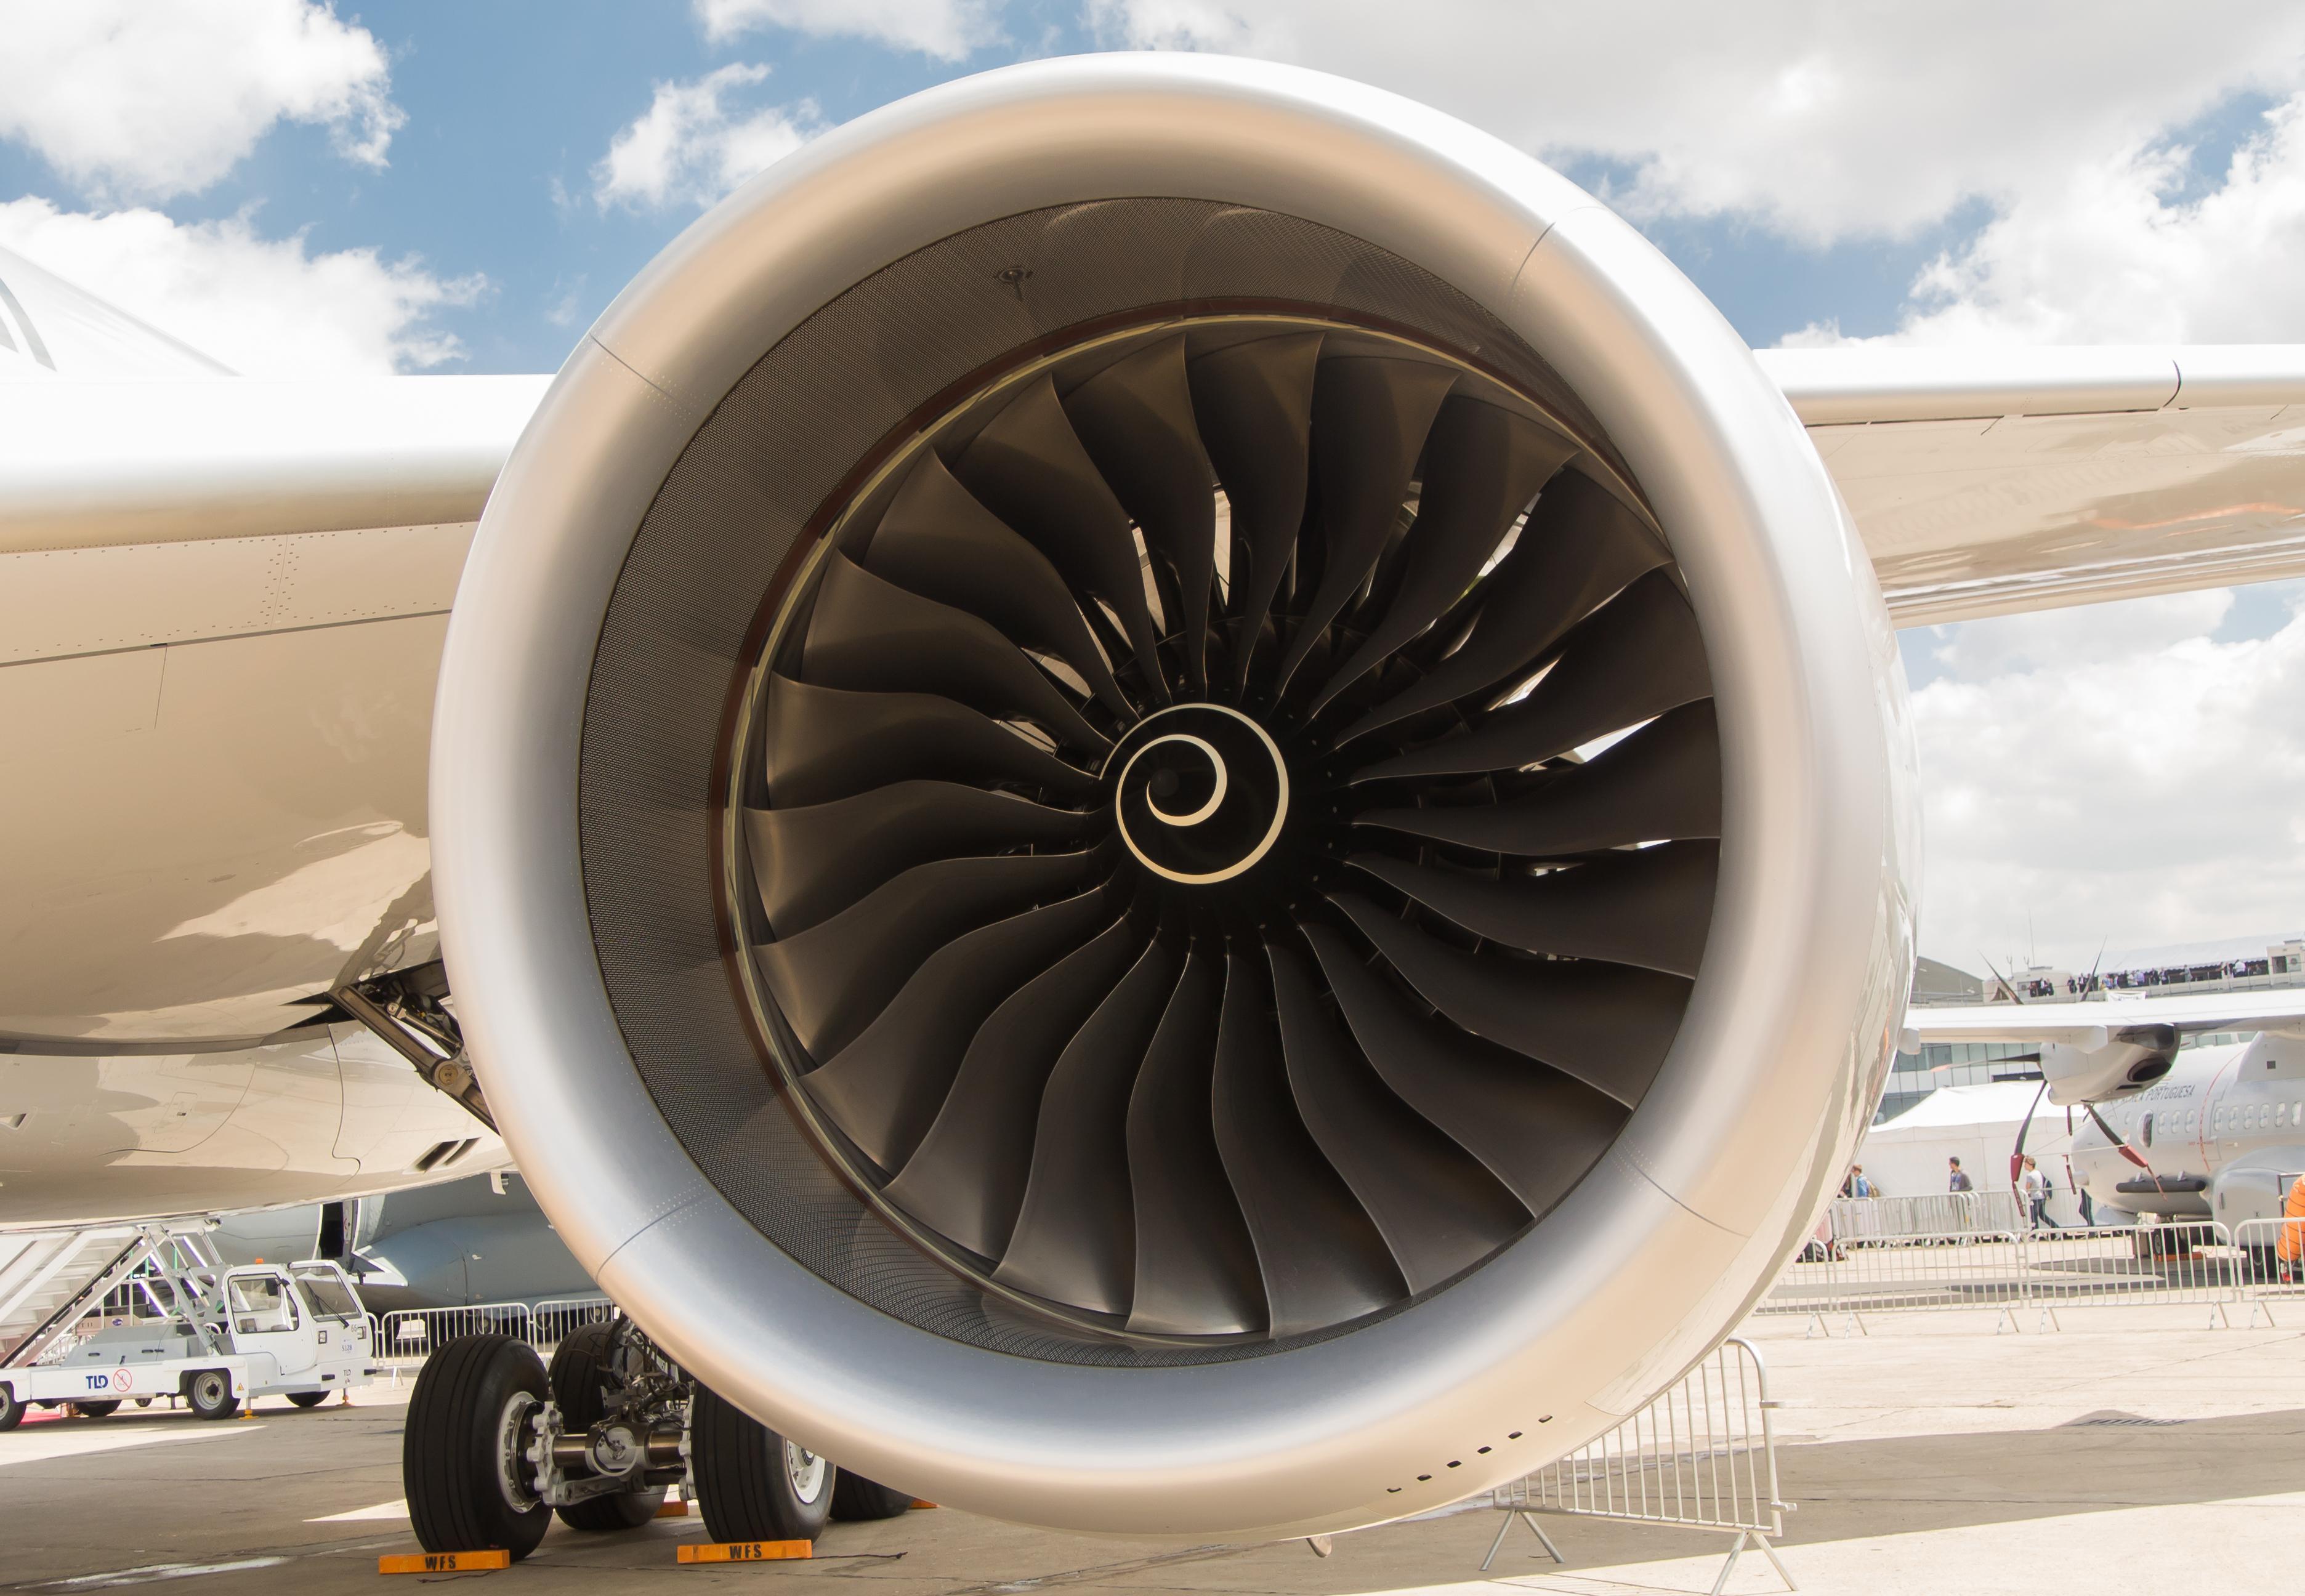 file airbus a350 a7 ald rolls royce trent xwb jpg wikimedia commons